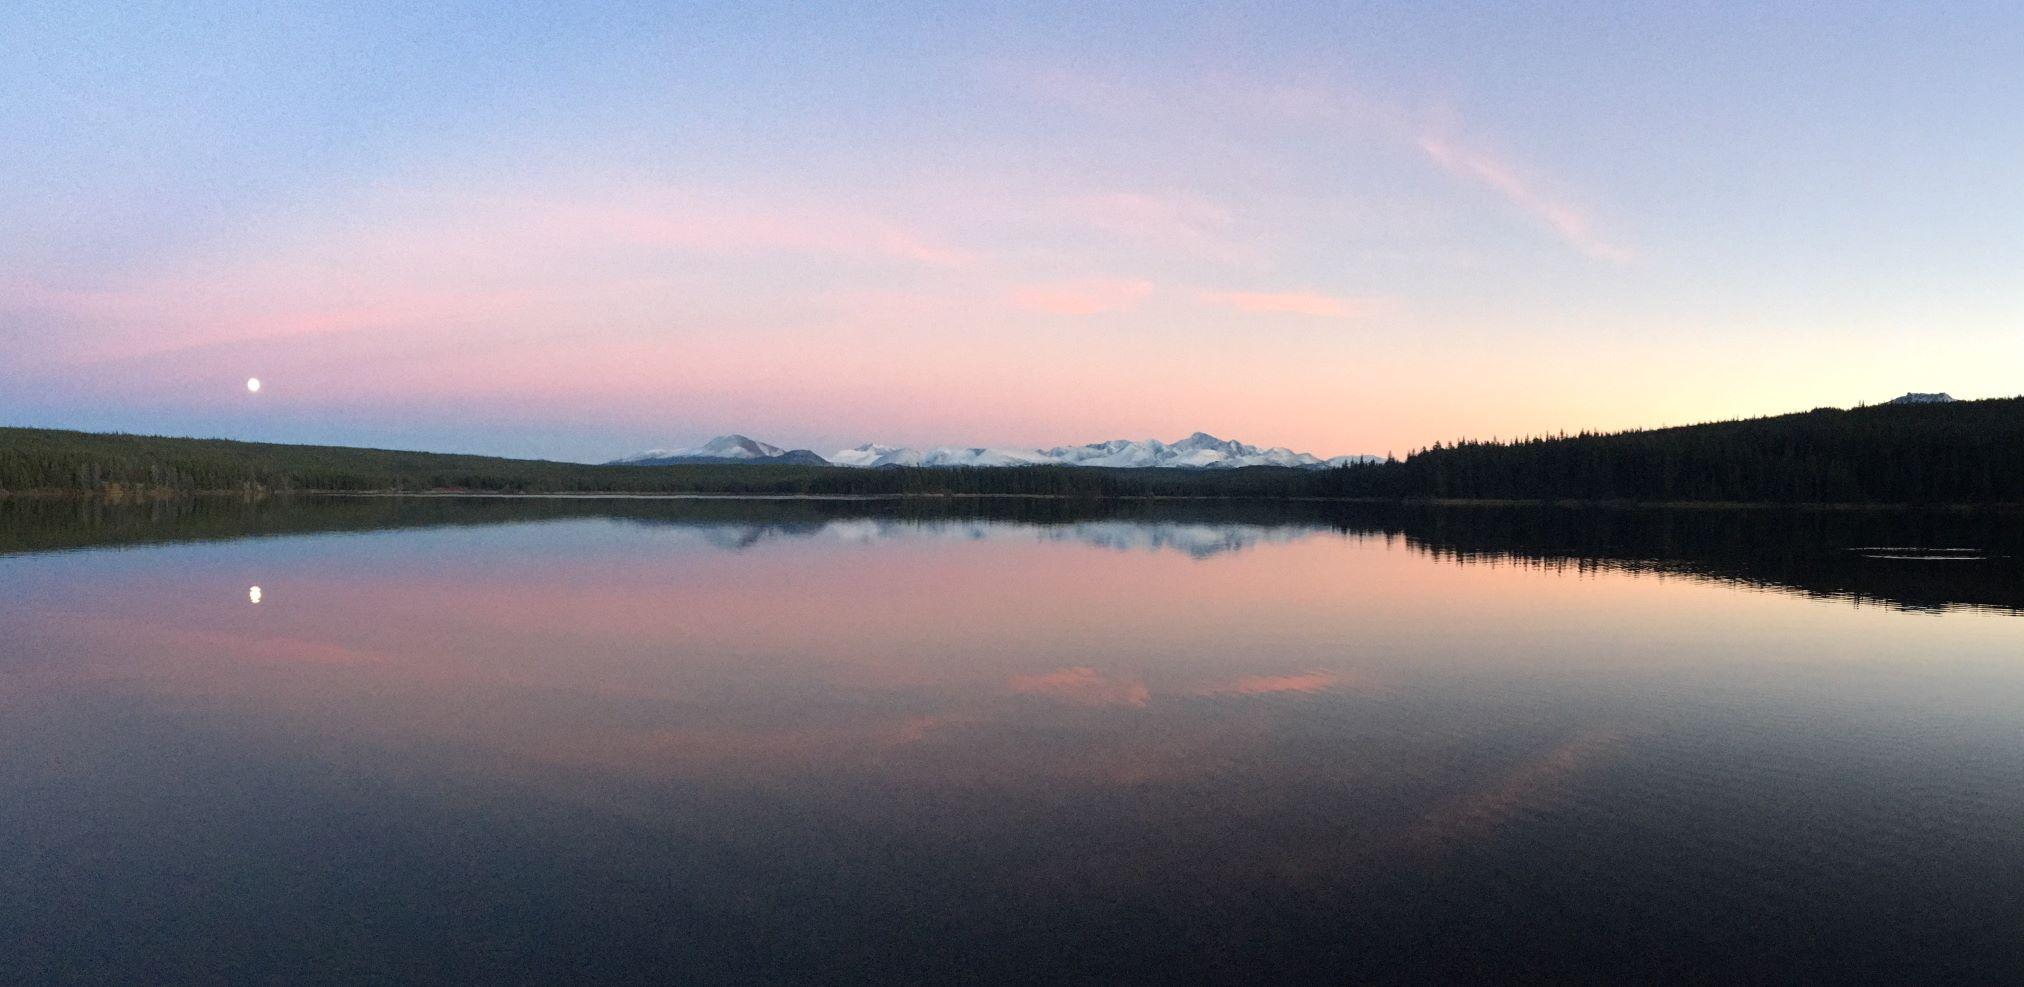 Teztan Biny (Fish Lake) in Tsilhqot'in territory (Photo: Jenna Dunsby)